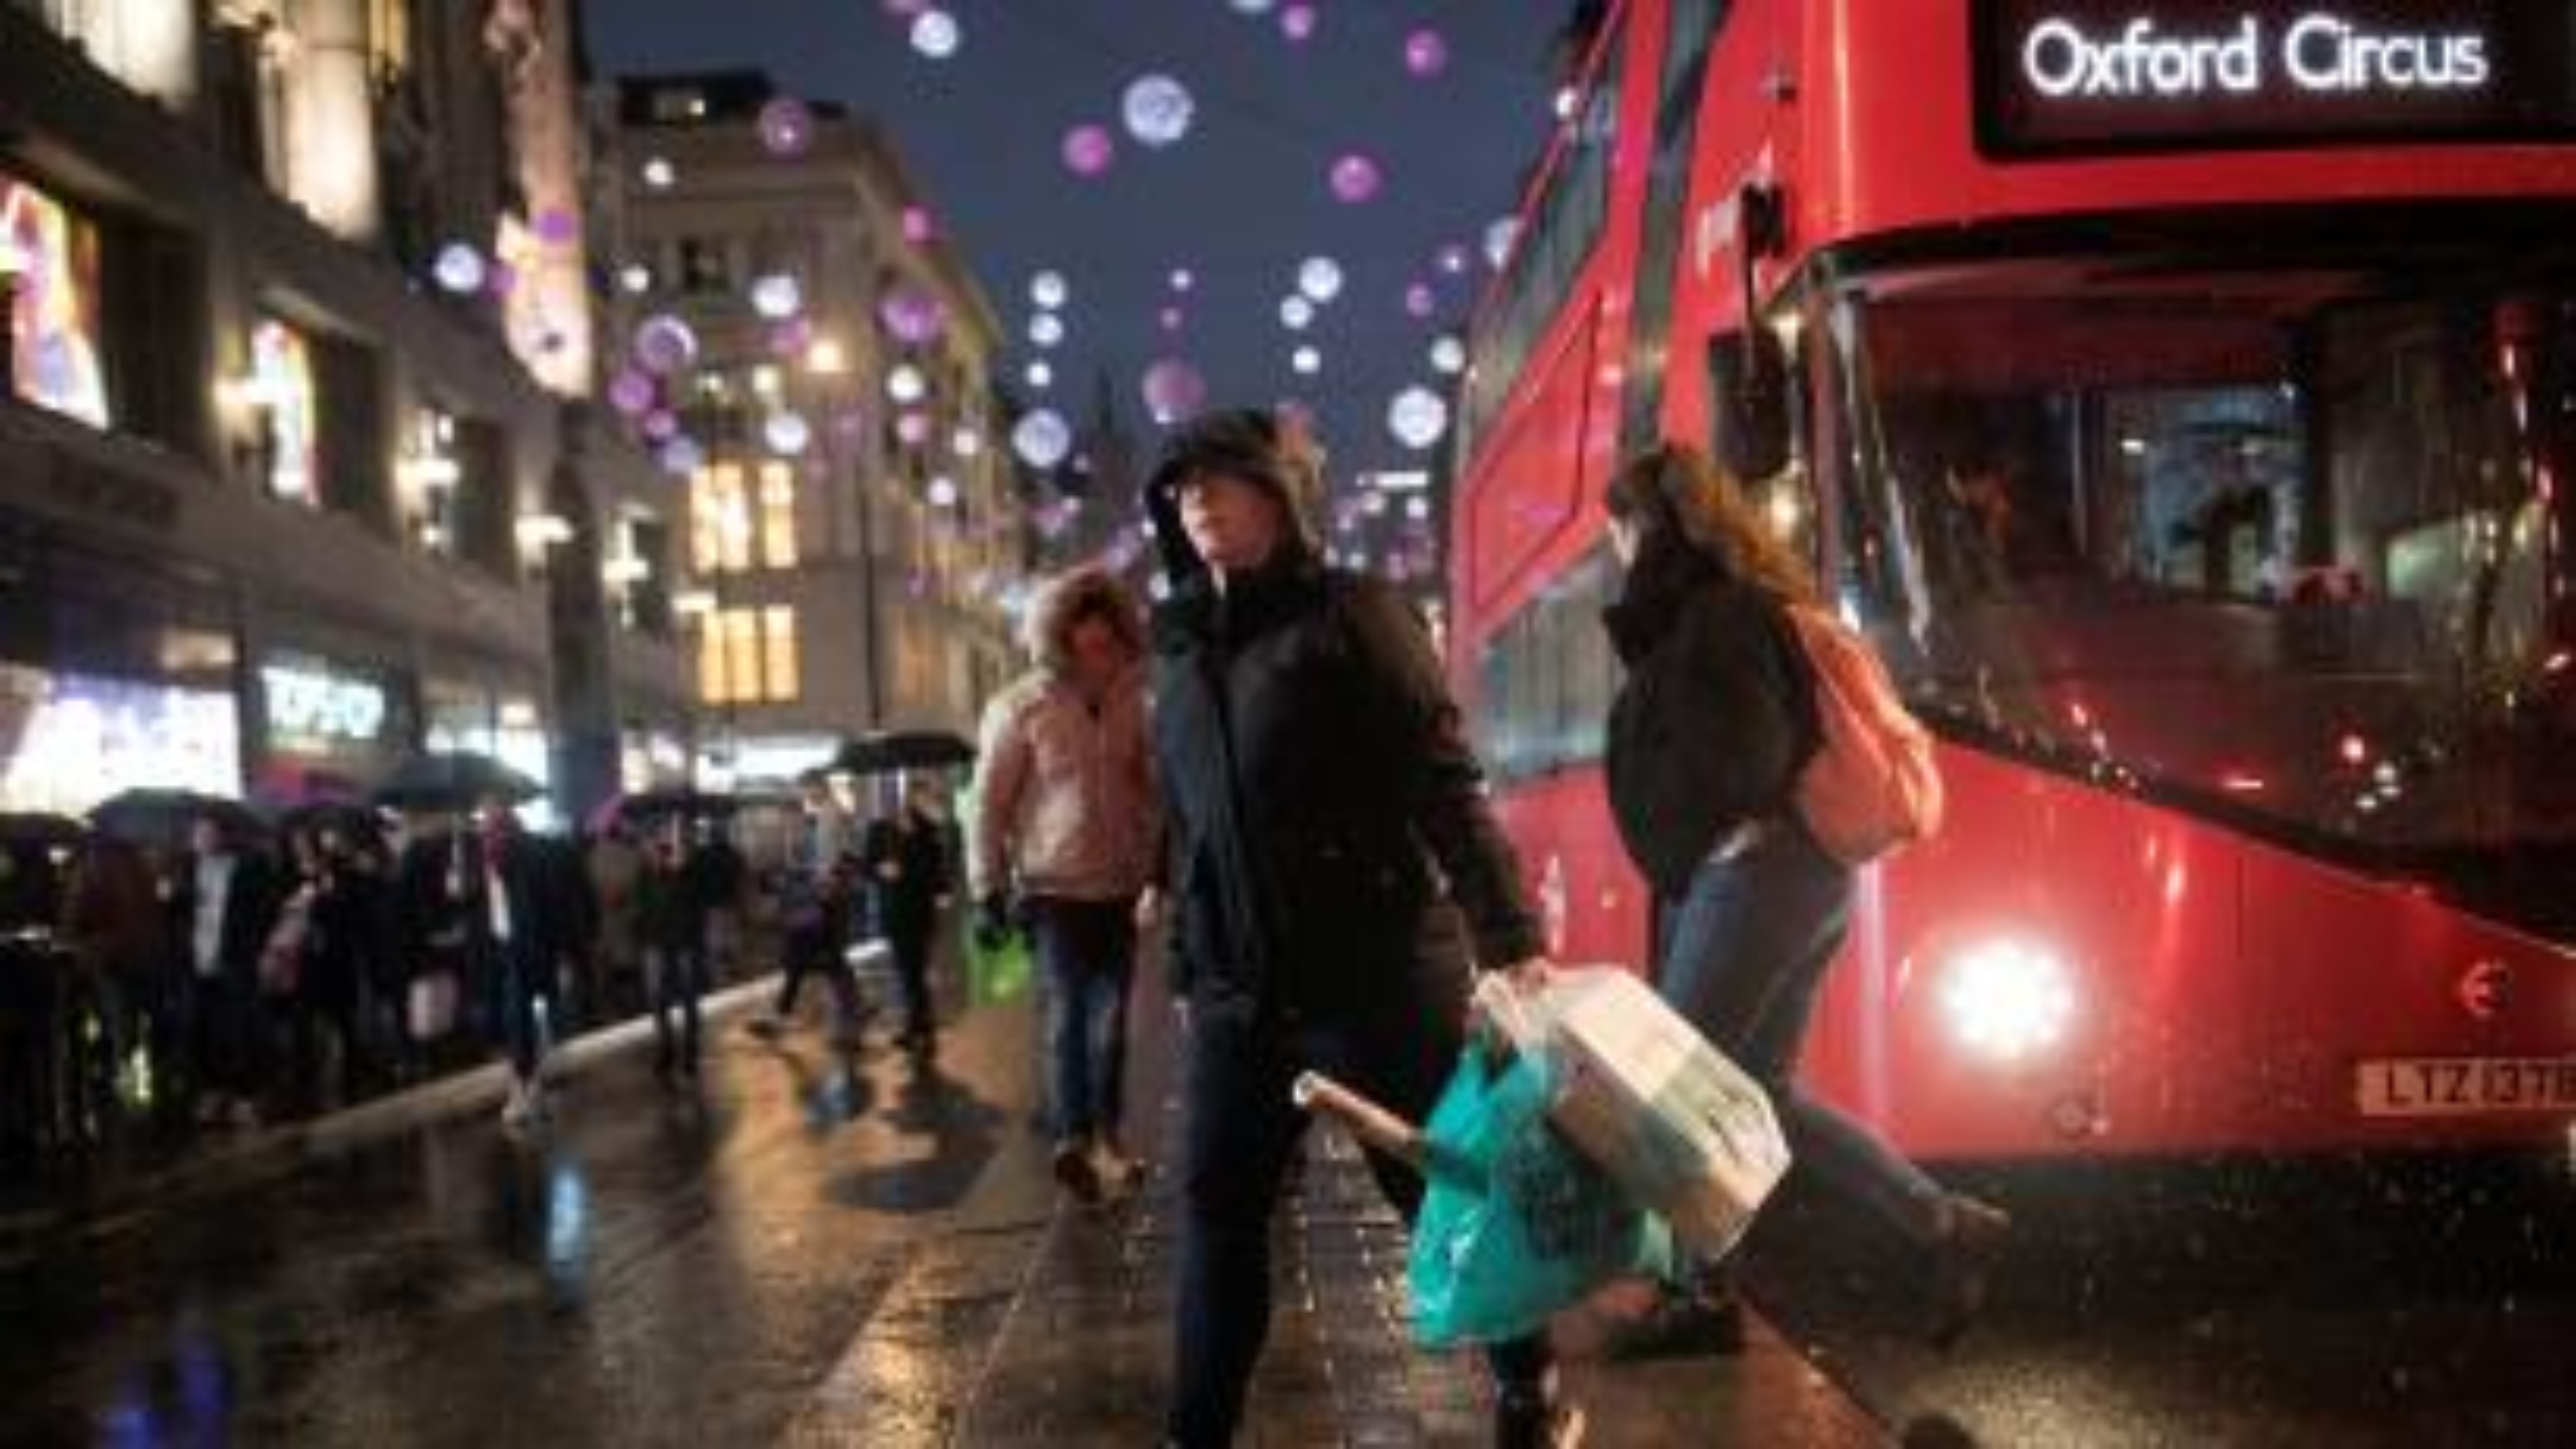 Shoppers cross the road on Oxford Street in London, Britain December 15, 2018. REUTERS/Simon Dawson/File Photo - RC19E21319B0